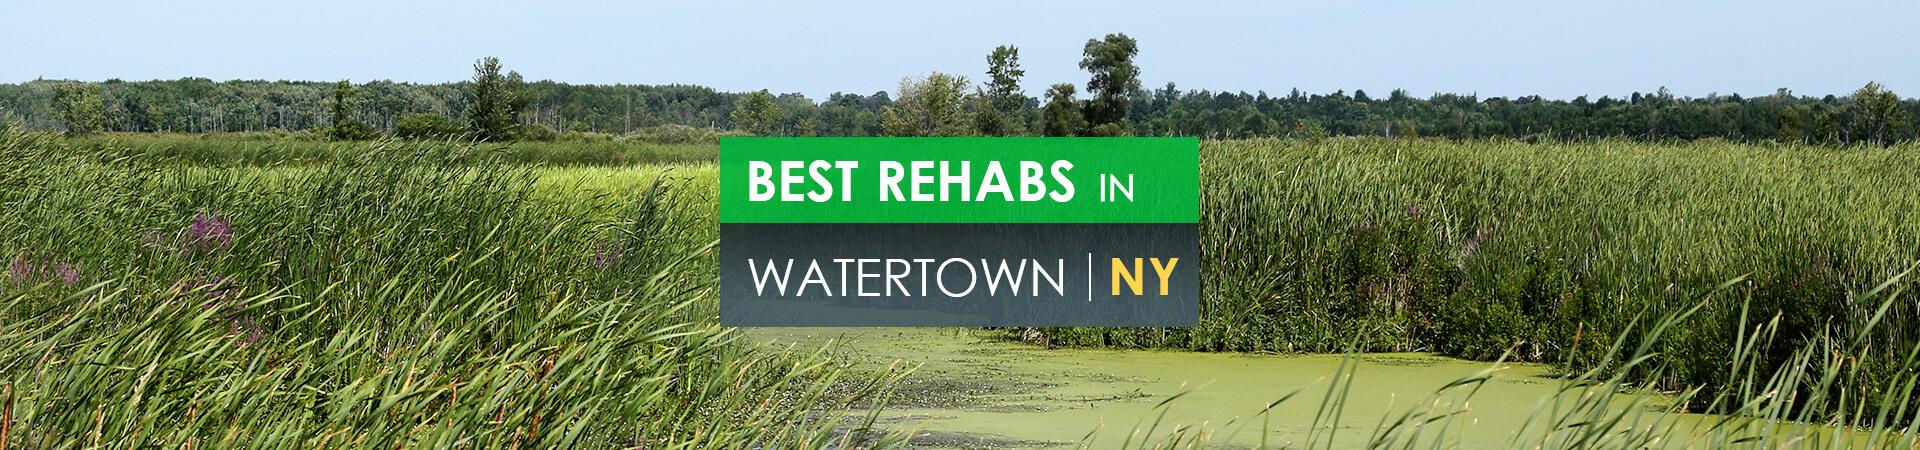 Best rehabs in Watertown, NY